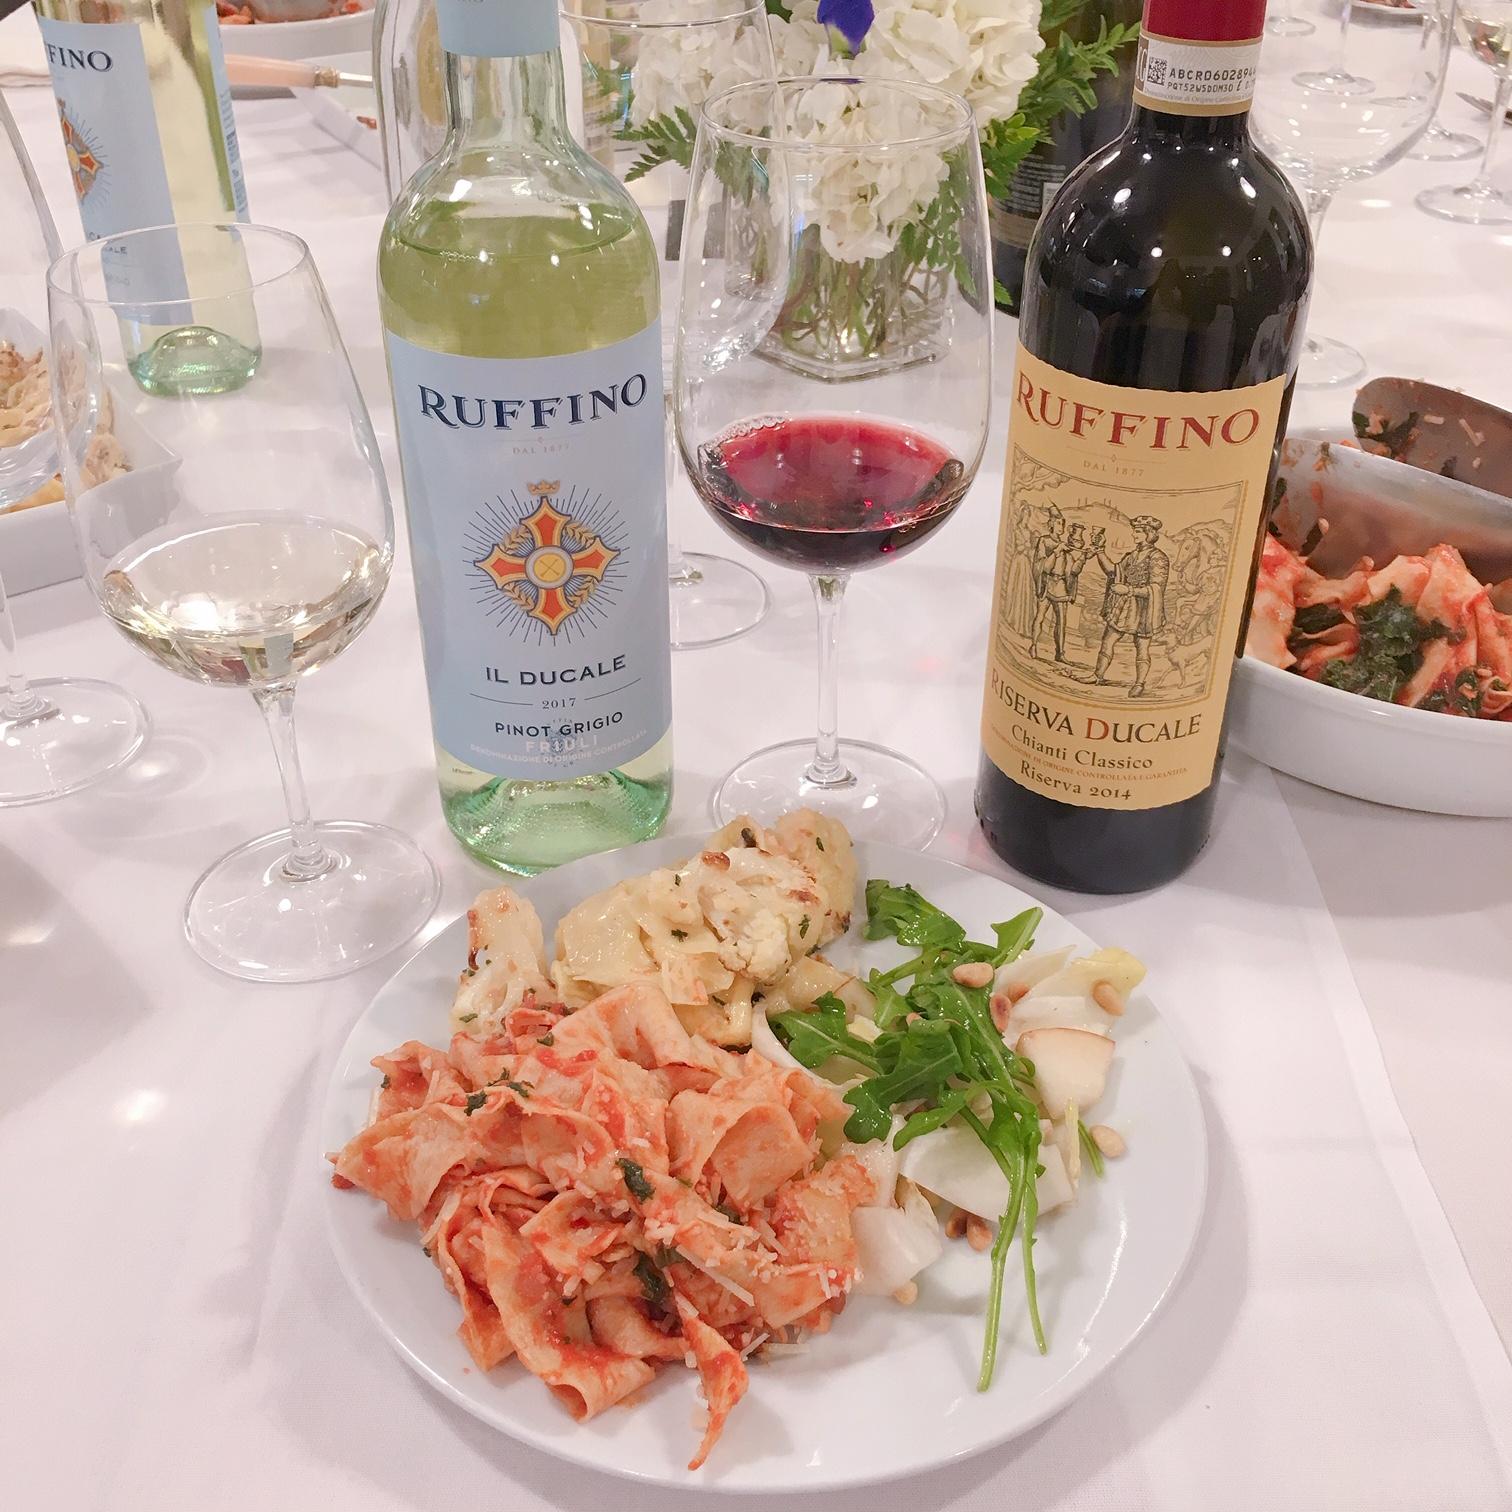 Ruffino Winery and pasta making cooking class